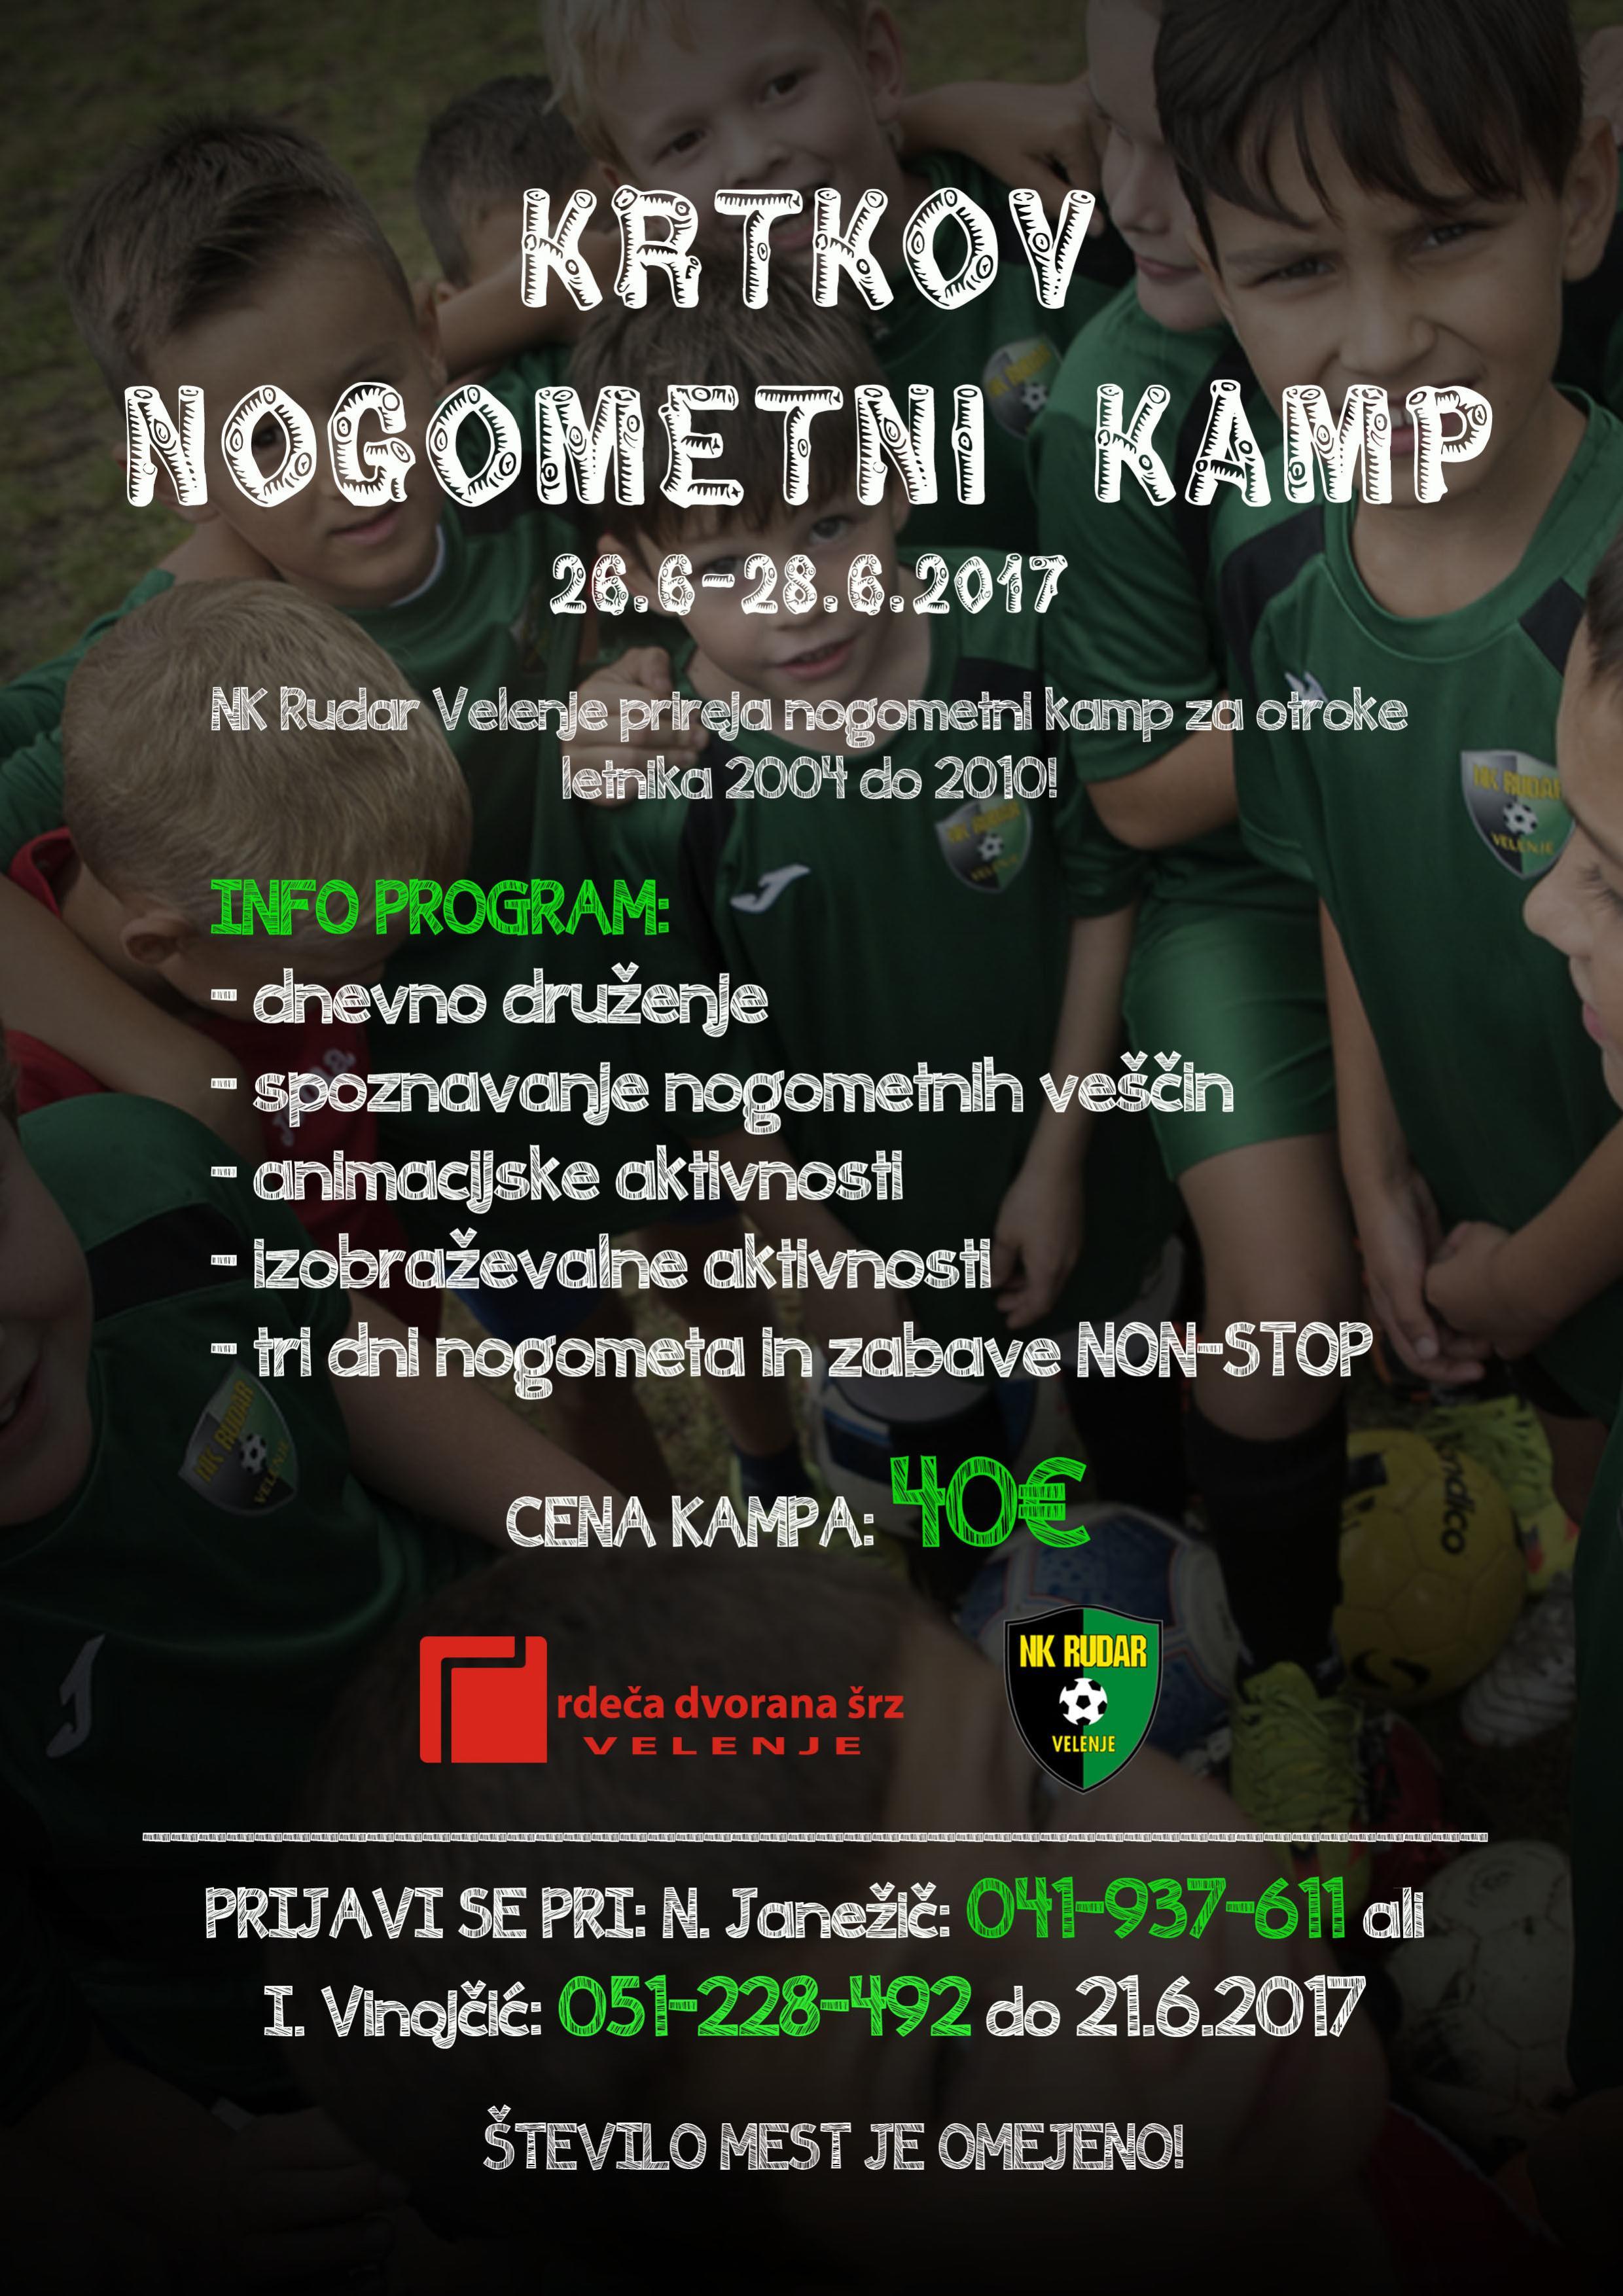 LETAK KRTKOV KAMP RD-page-001